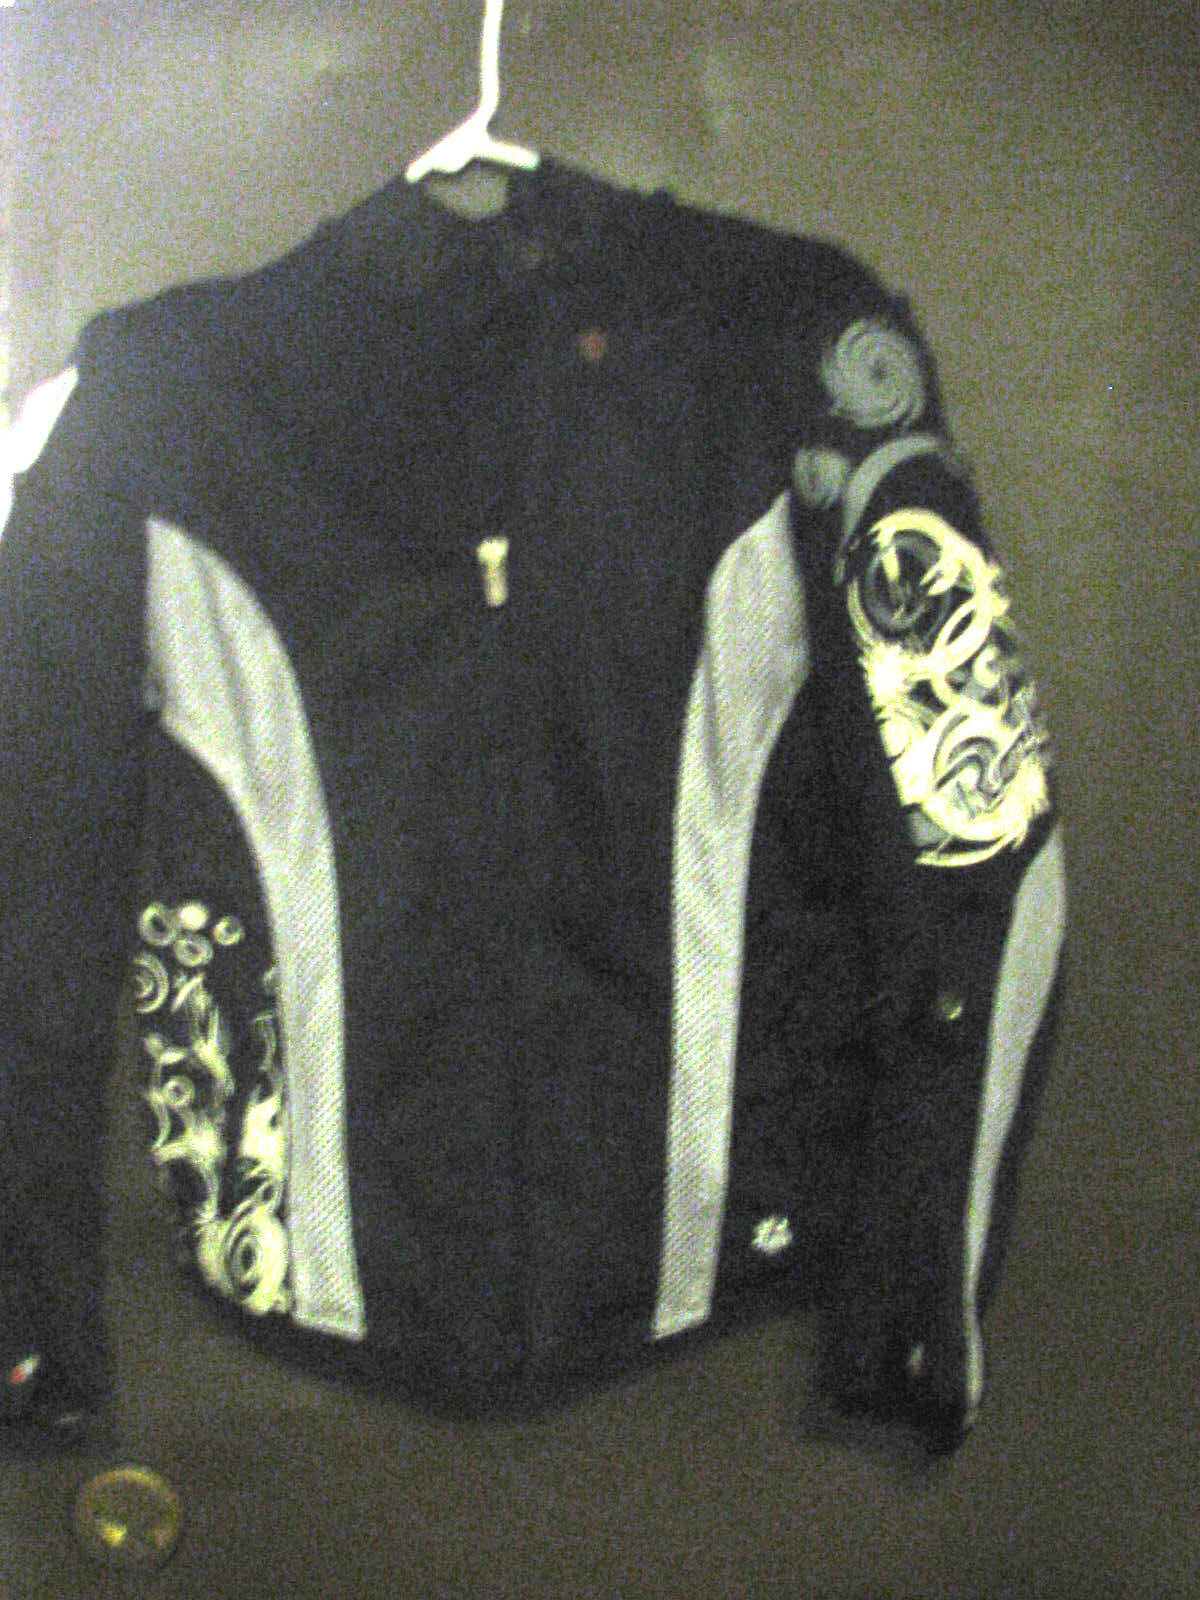 Joe rocket jacket damen SMALL